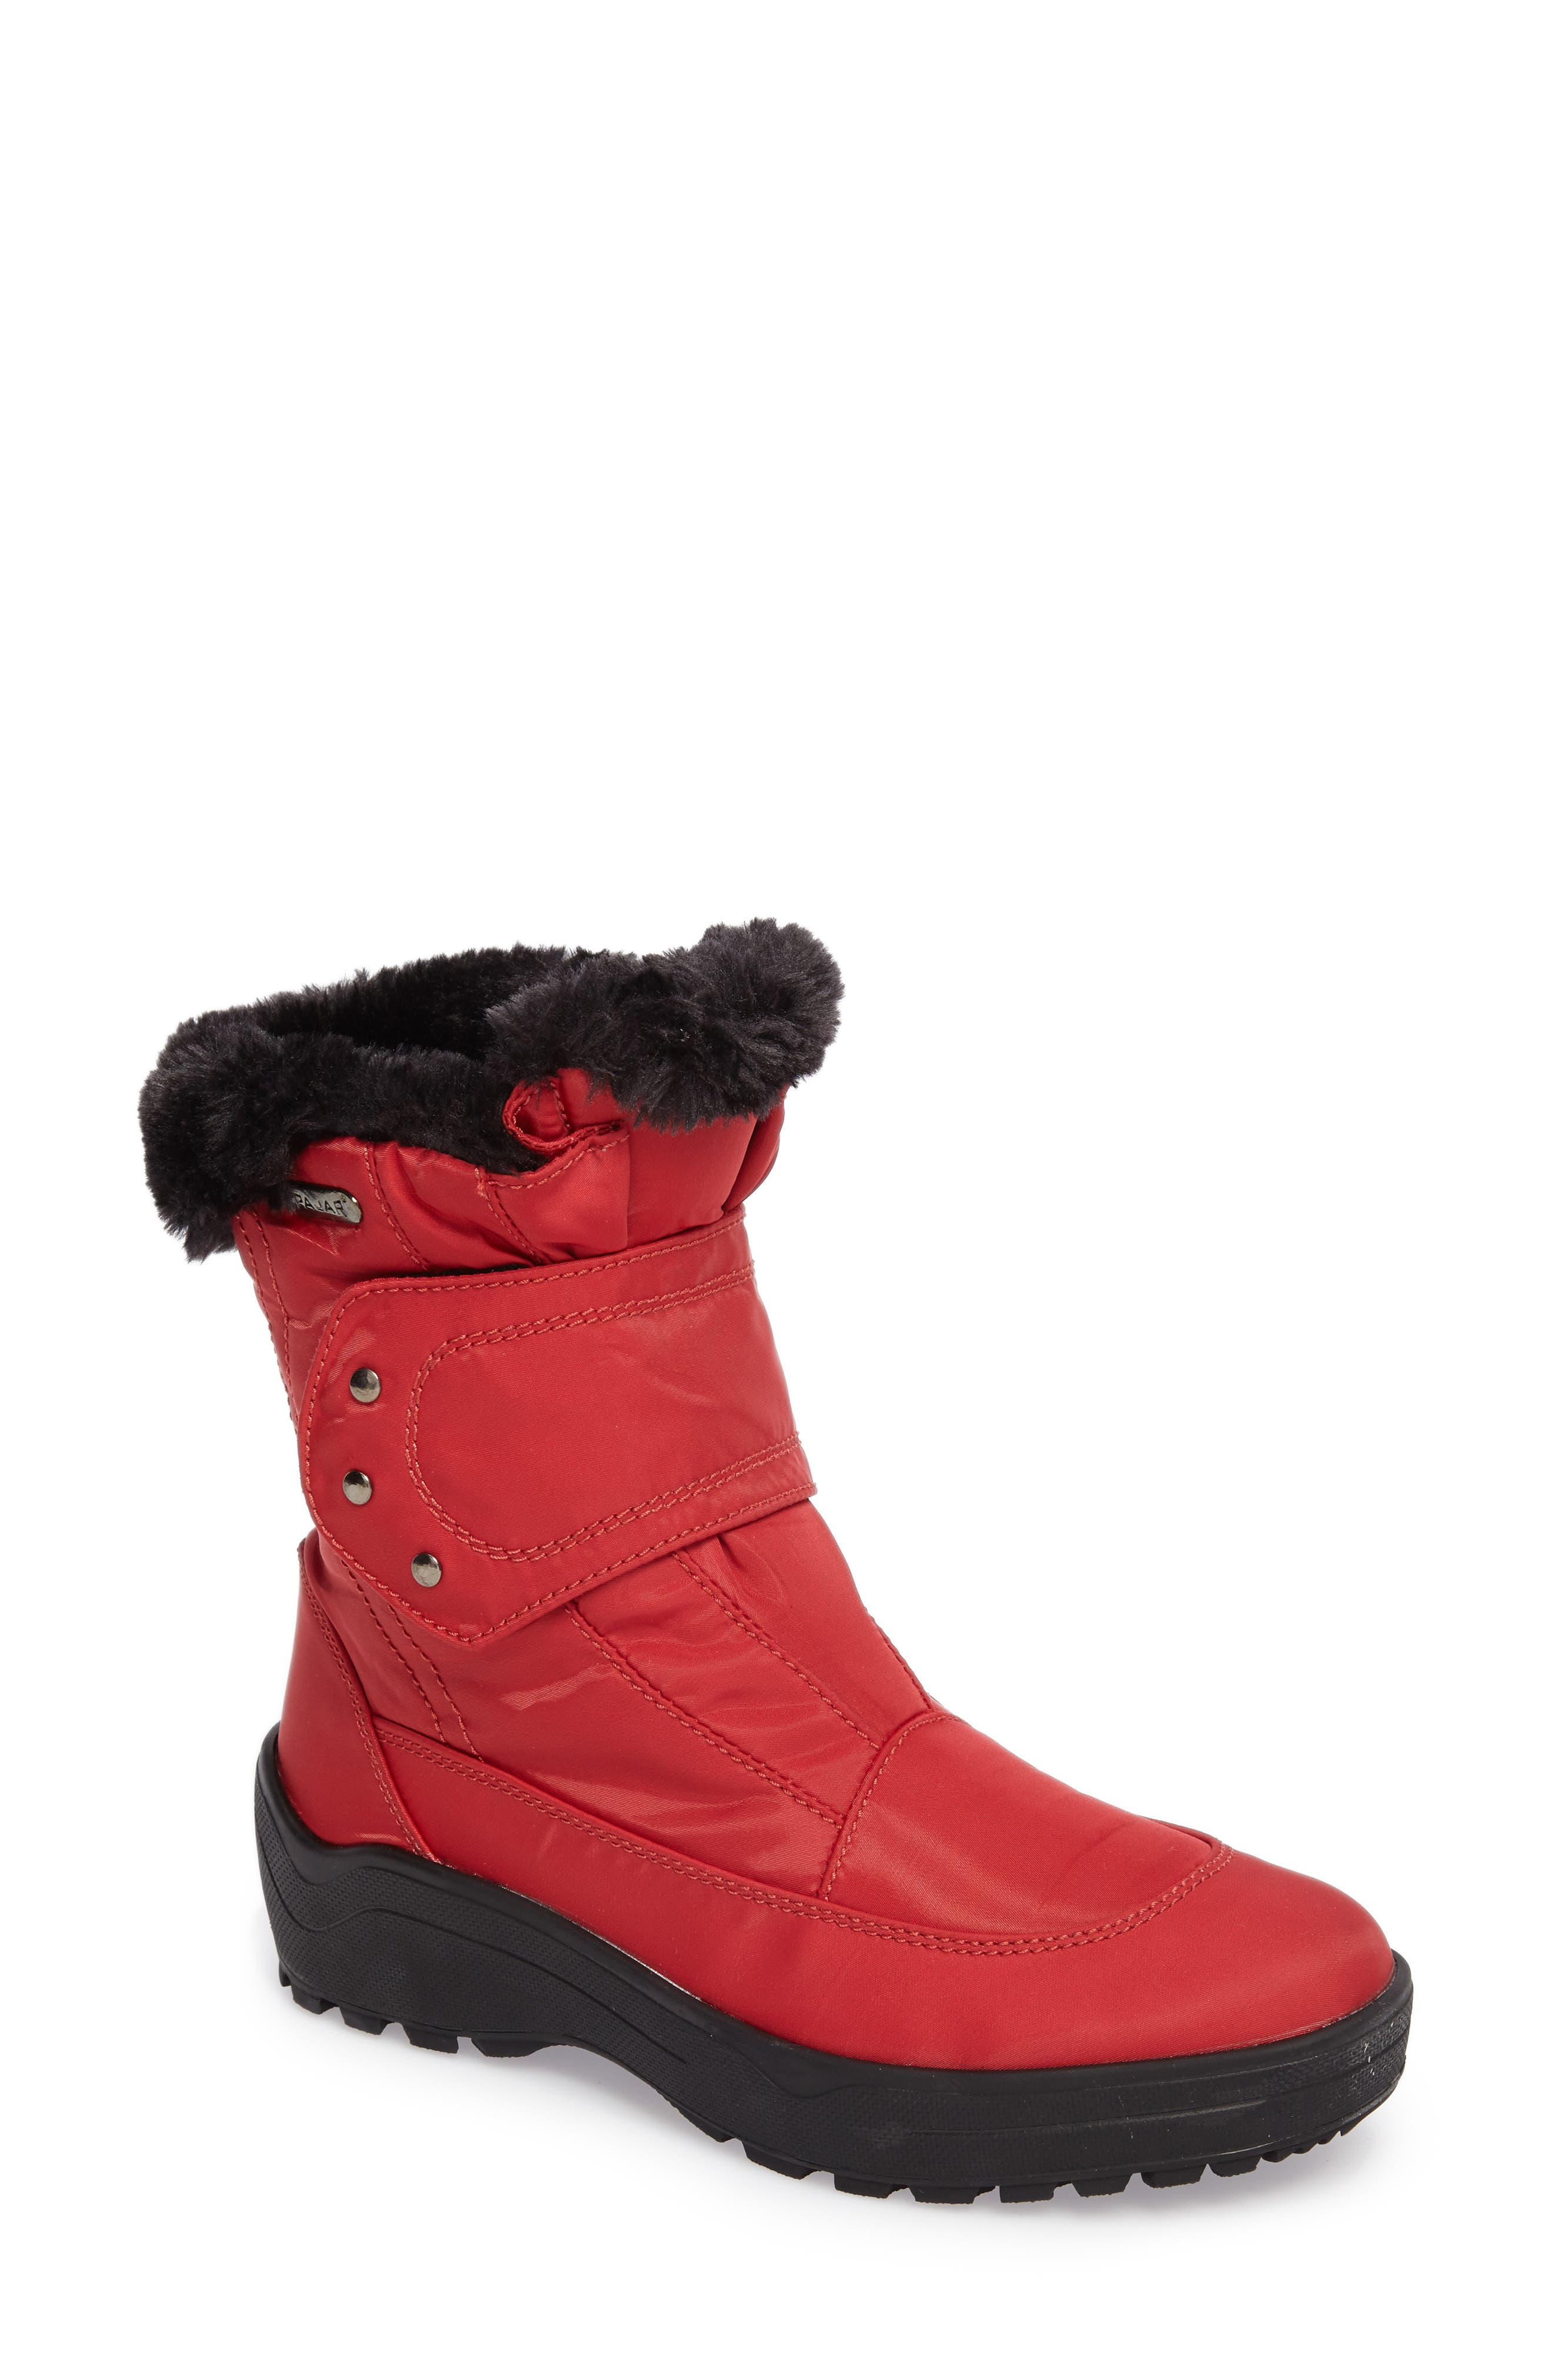 Main Image - Pajar Shoes 'Moscou' Snow Boot (Women)